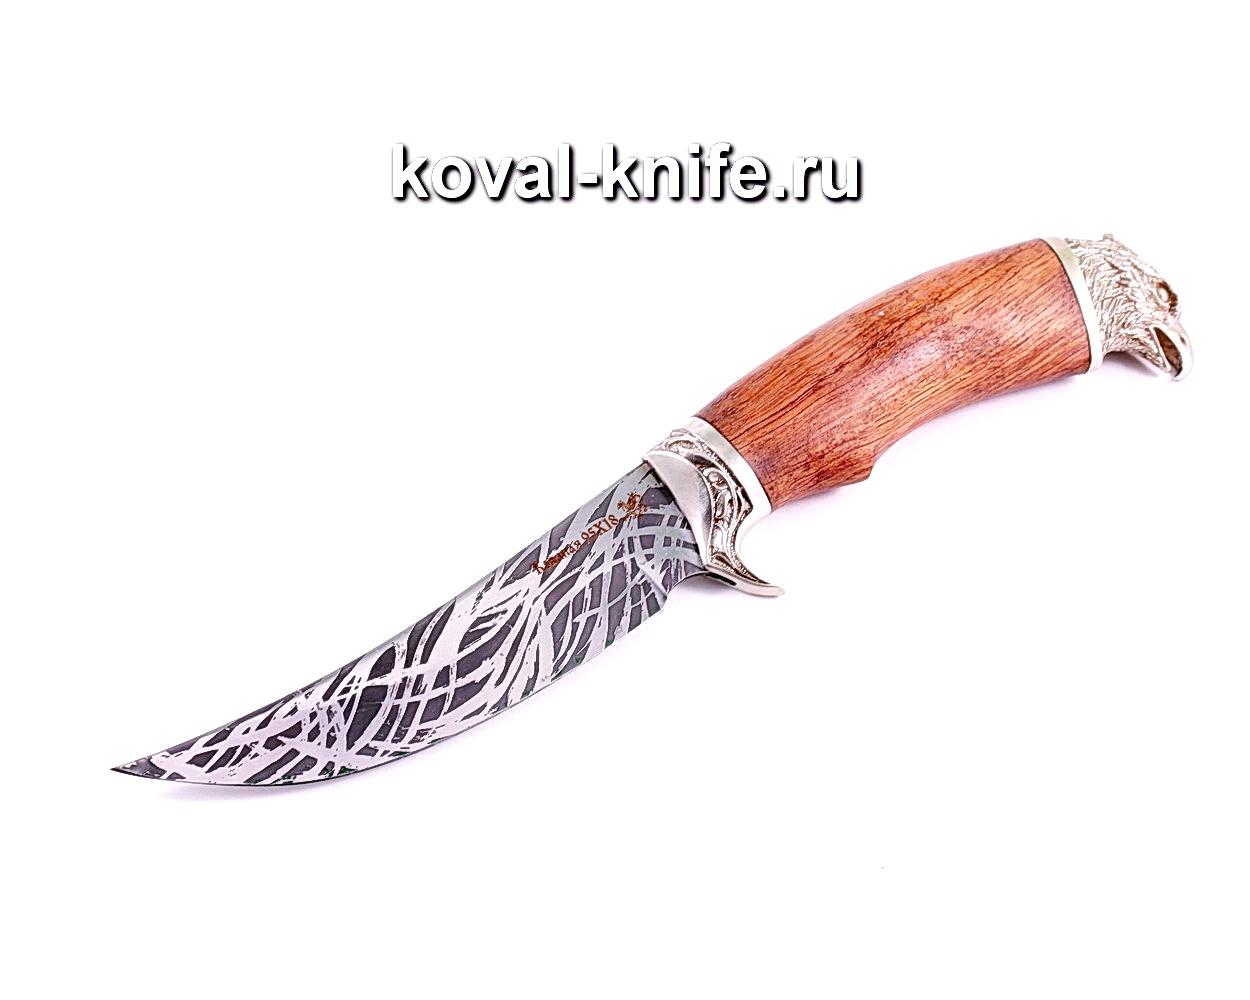 Нож Ворон (сталь 95х18), рукоять бубинга, литье A007